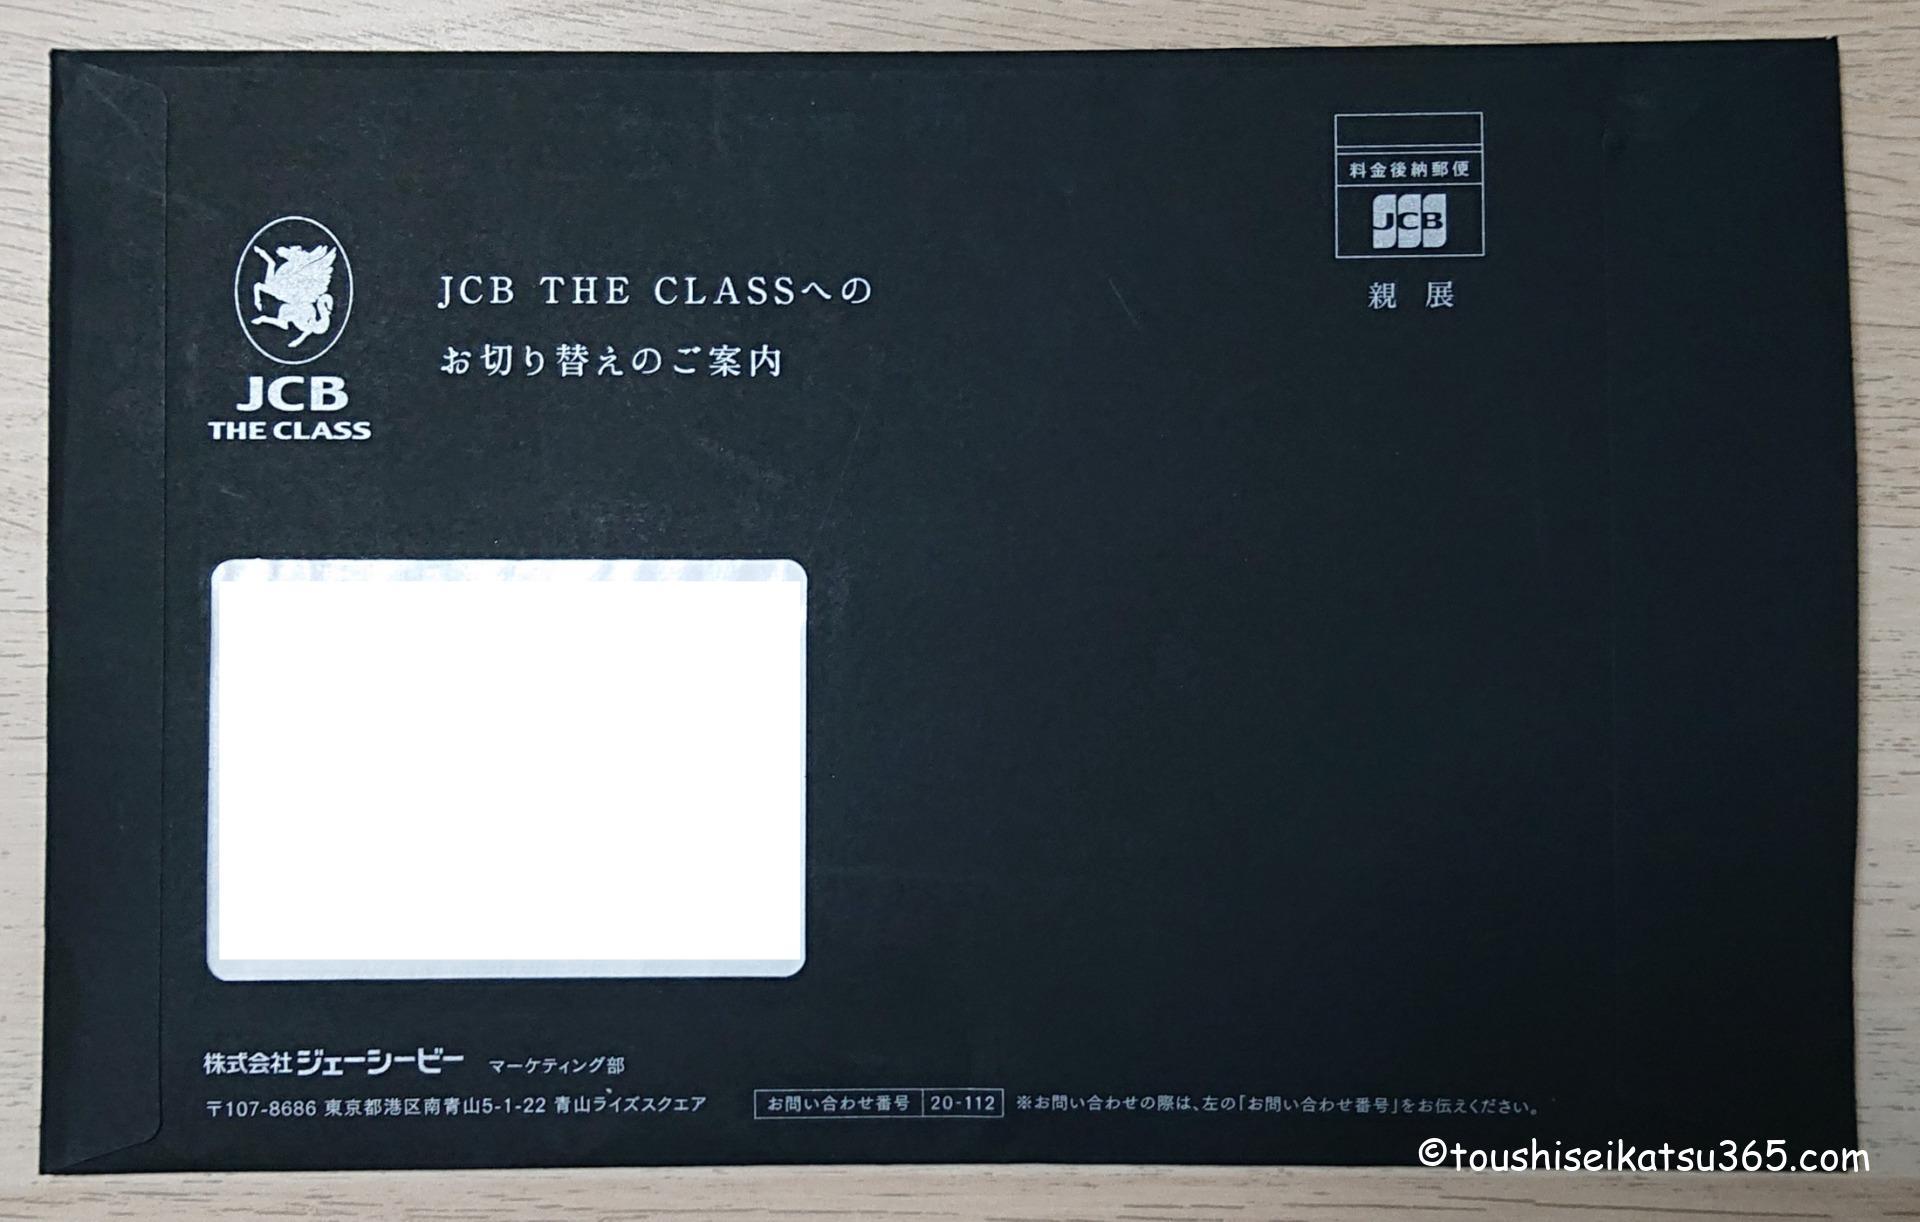 JCB THE CLASSインビテーション封筒|表